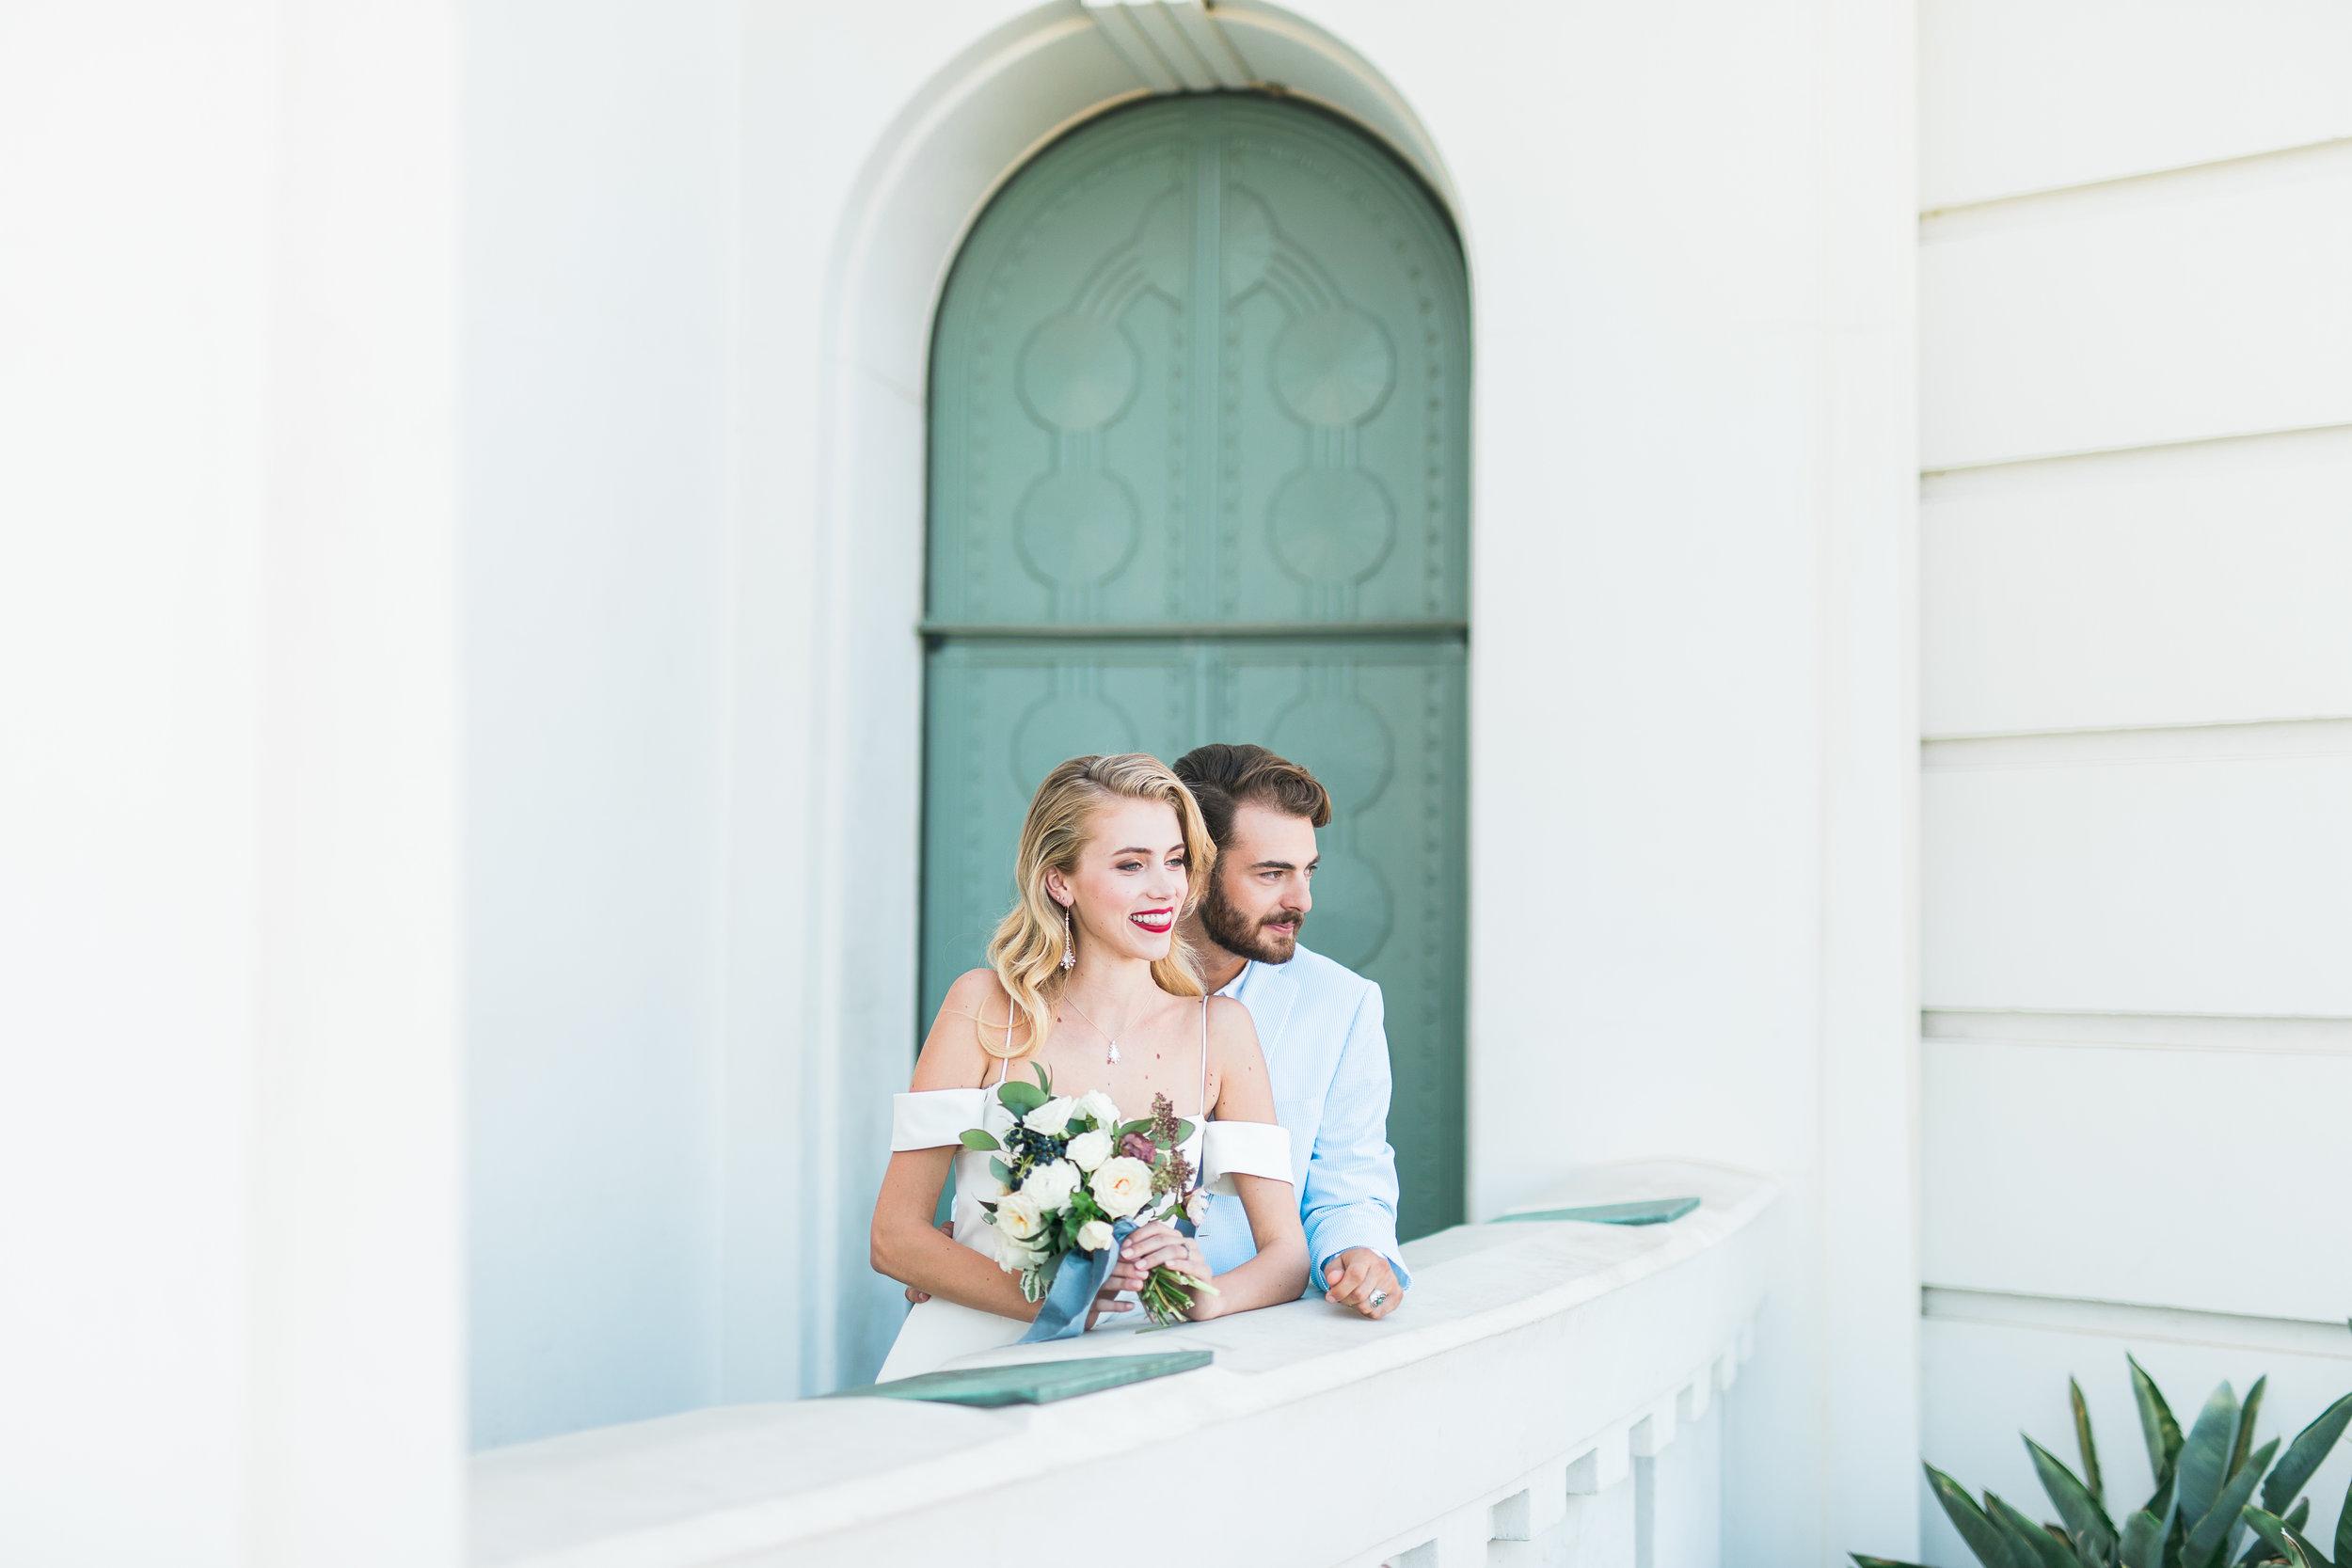 LA-Wedding-Shoot-by-JBJ-Pictures-94.jpg